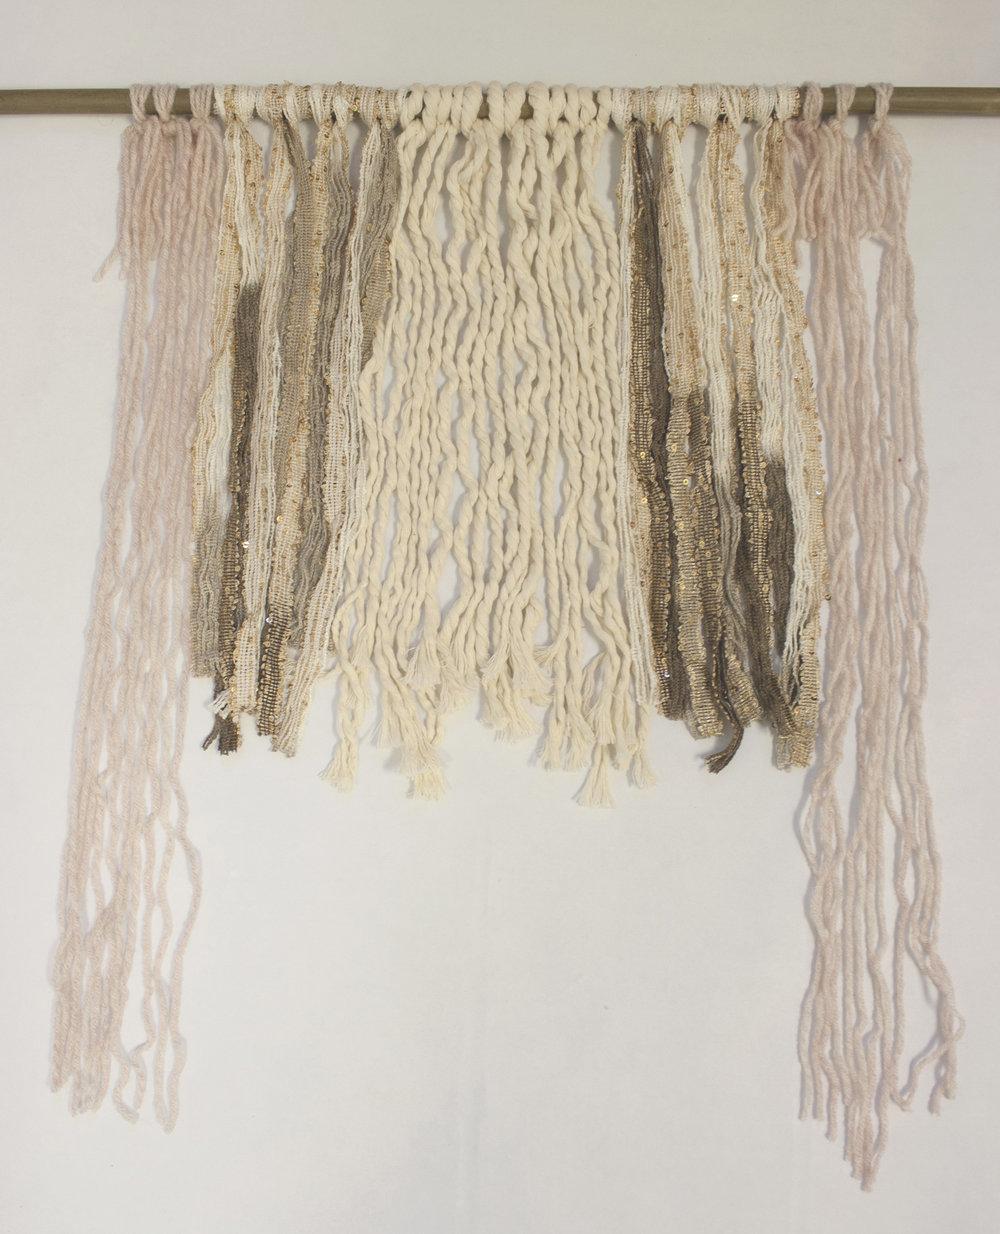 The shorter strands use Lark's Head Knots, the longer strands use regular knots